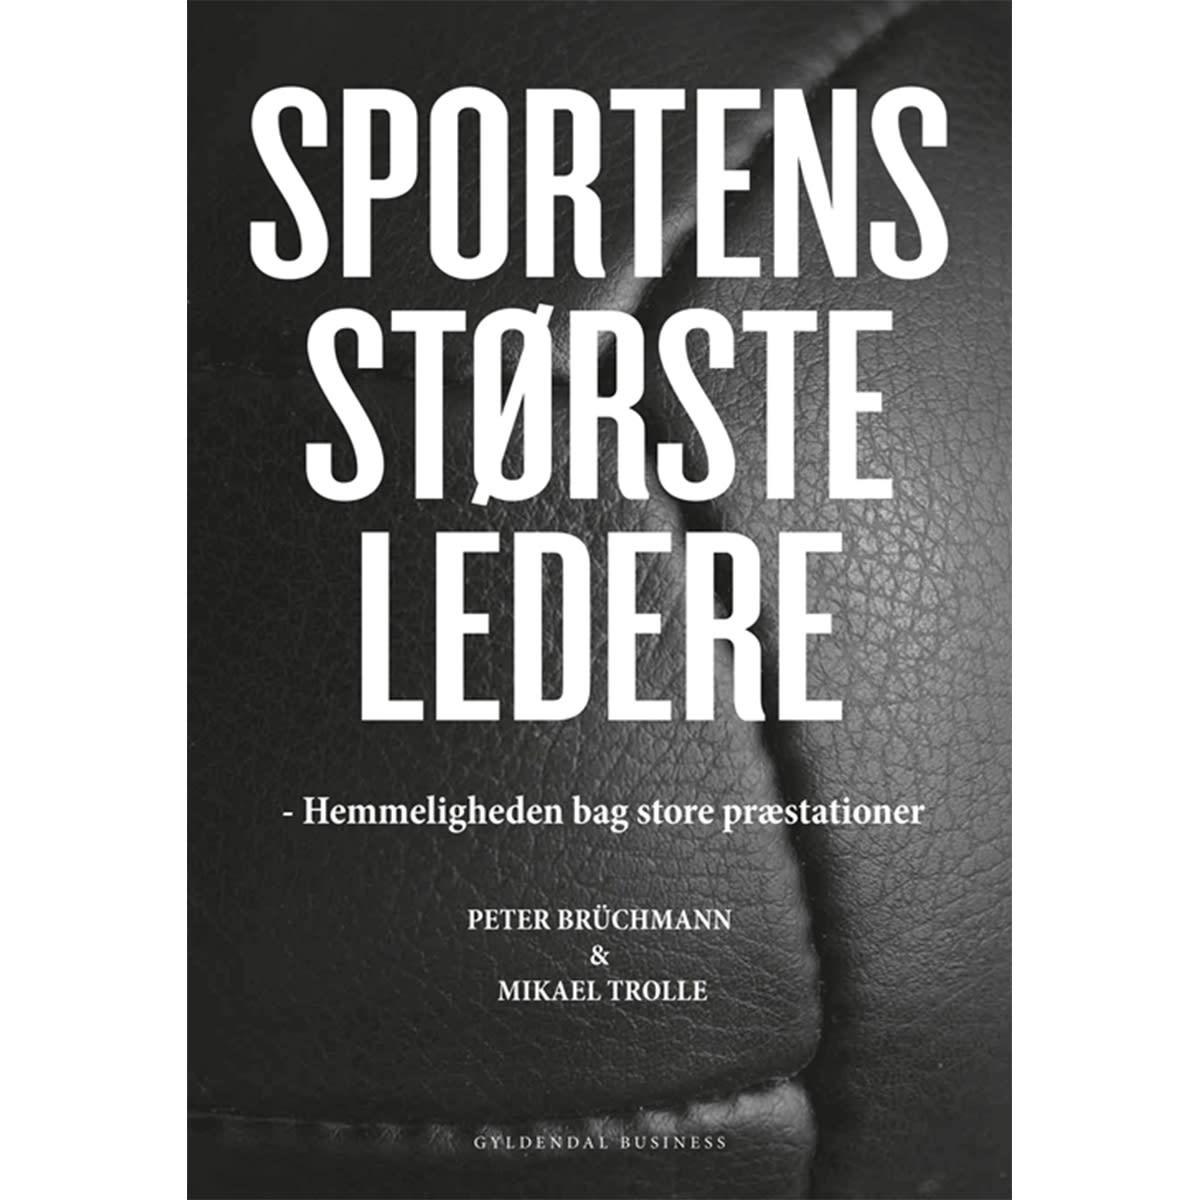 Af Mikael Trolle & Peter Brüchmann